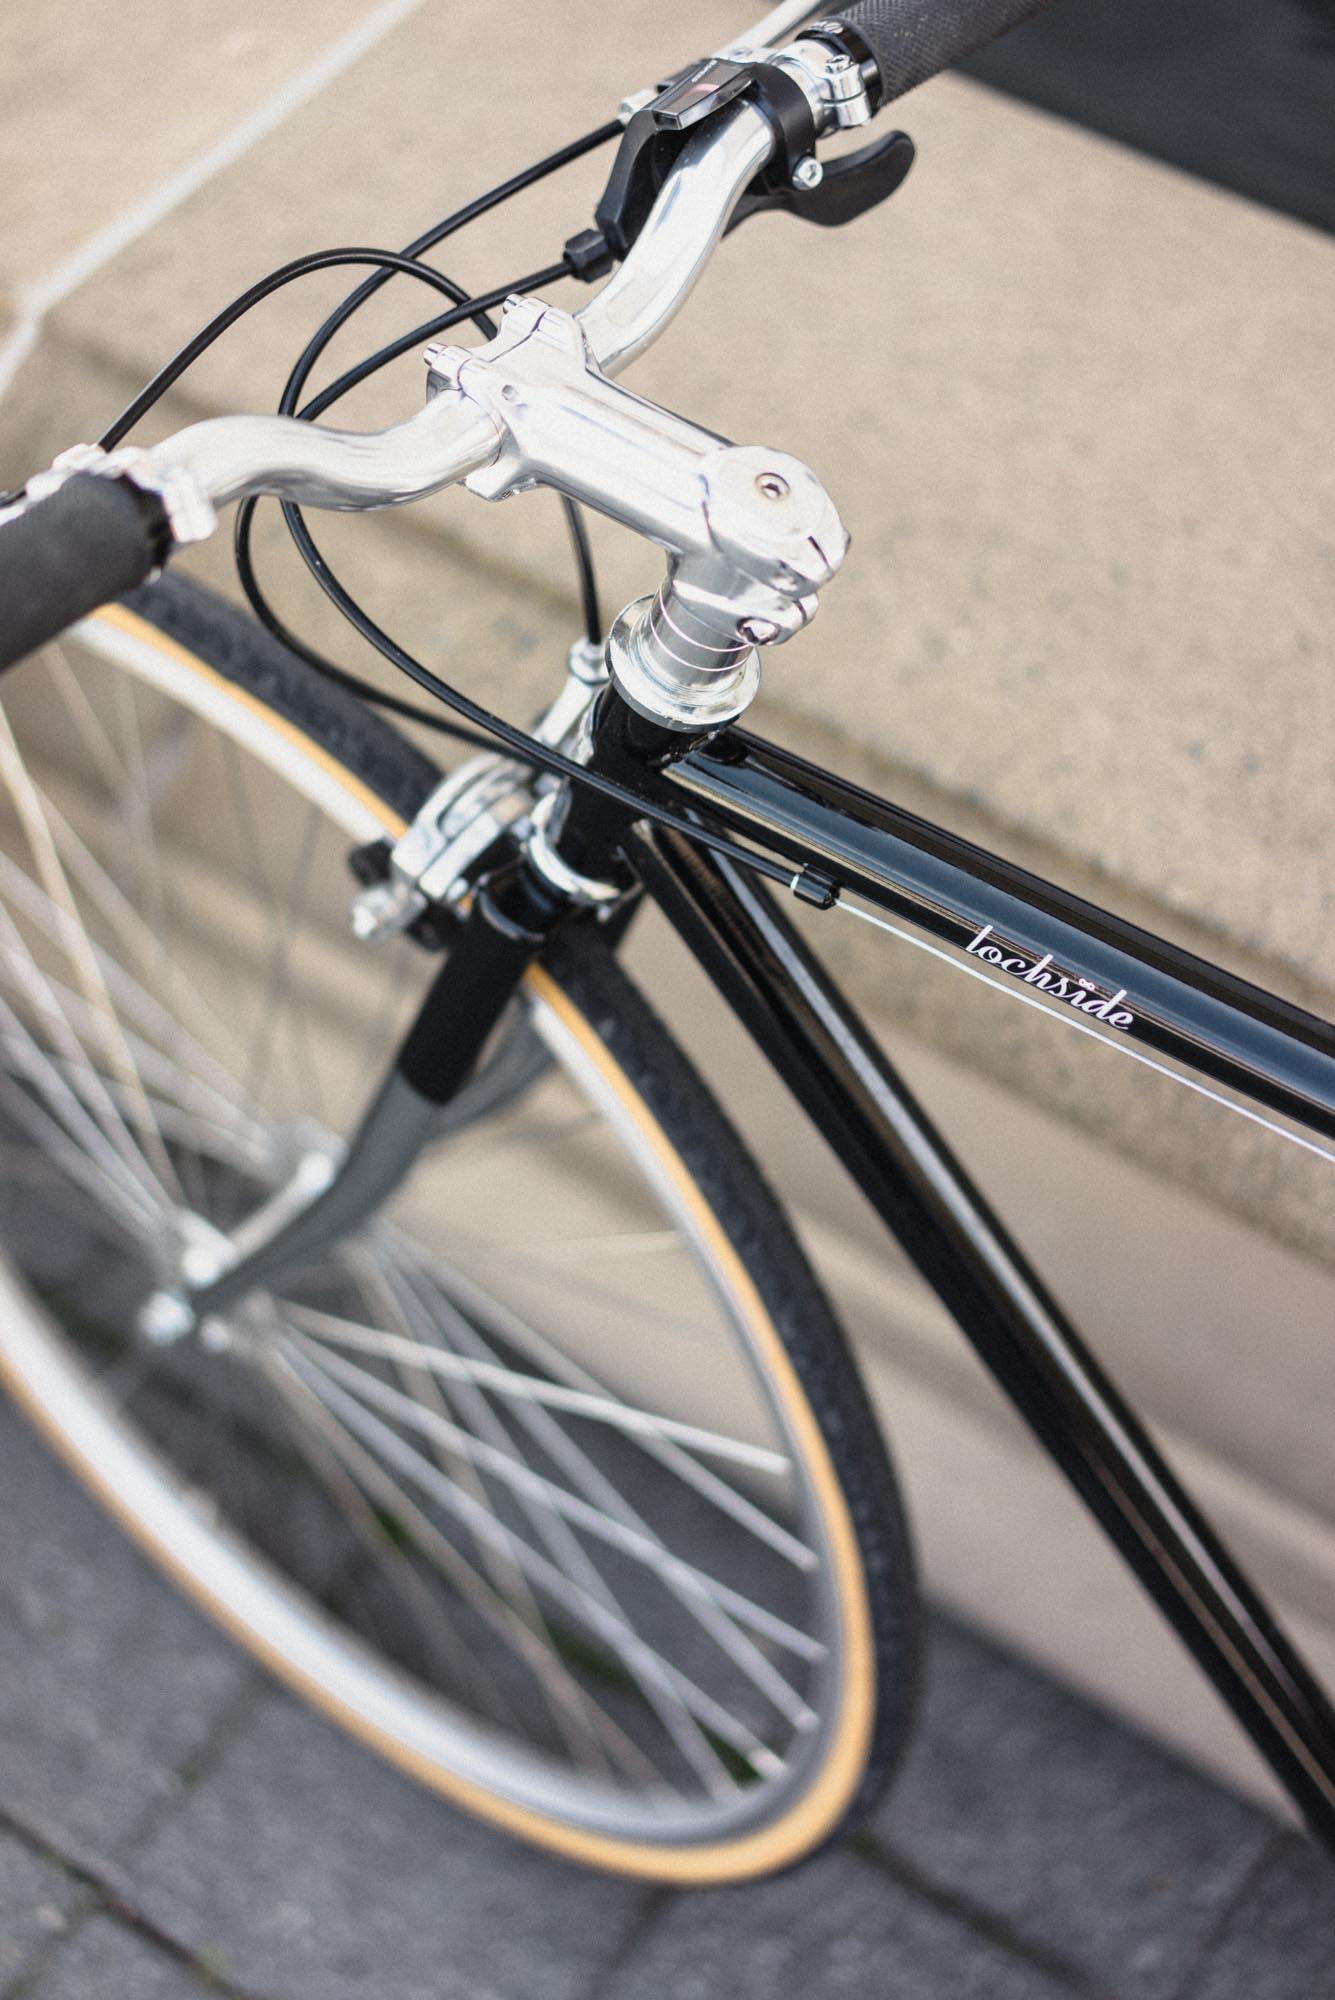 Lochisde Cycles 8-speed bike black rapid fier shifter wide gear ratio 309 Shimano Claris.jpg